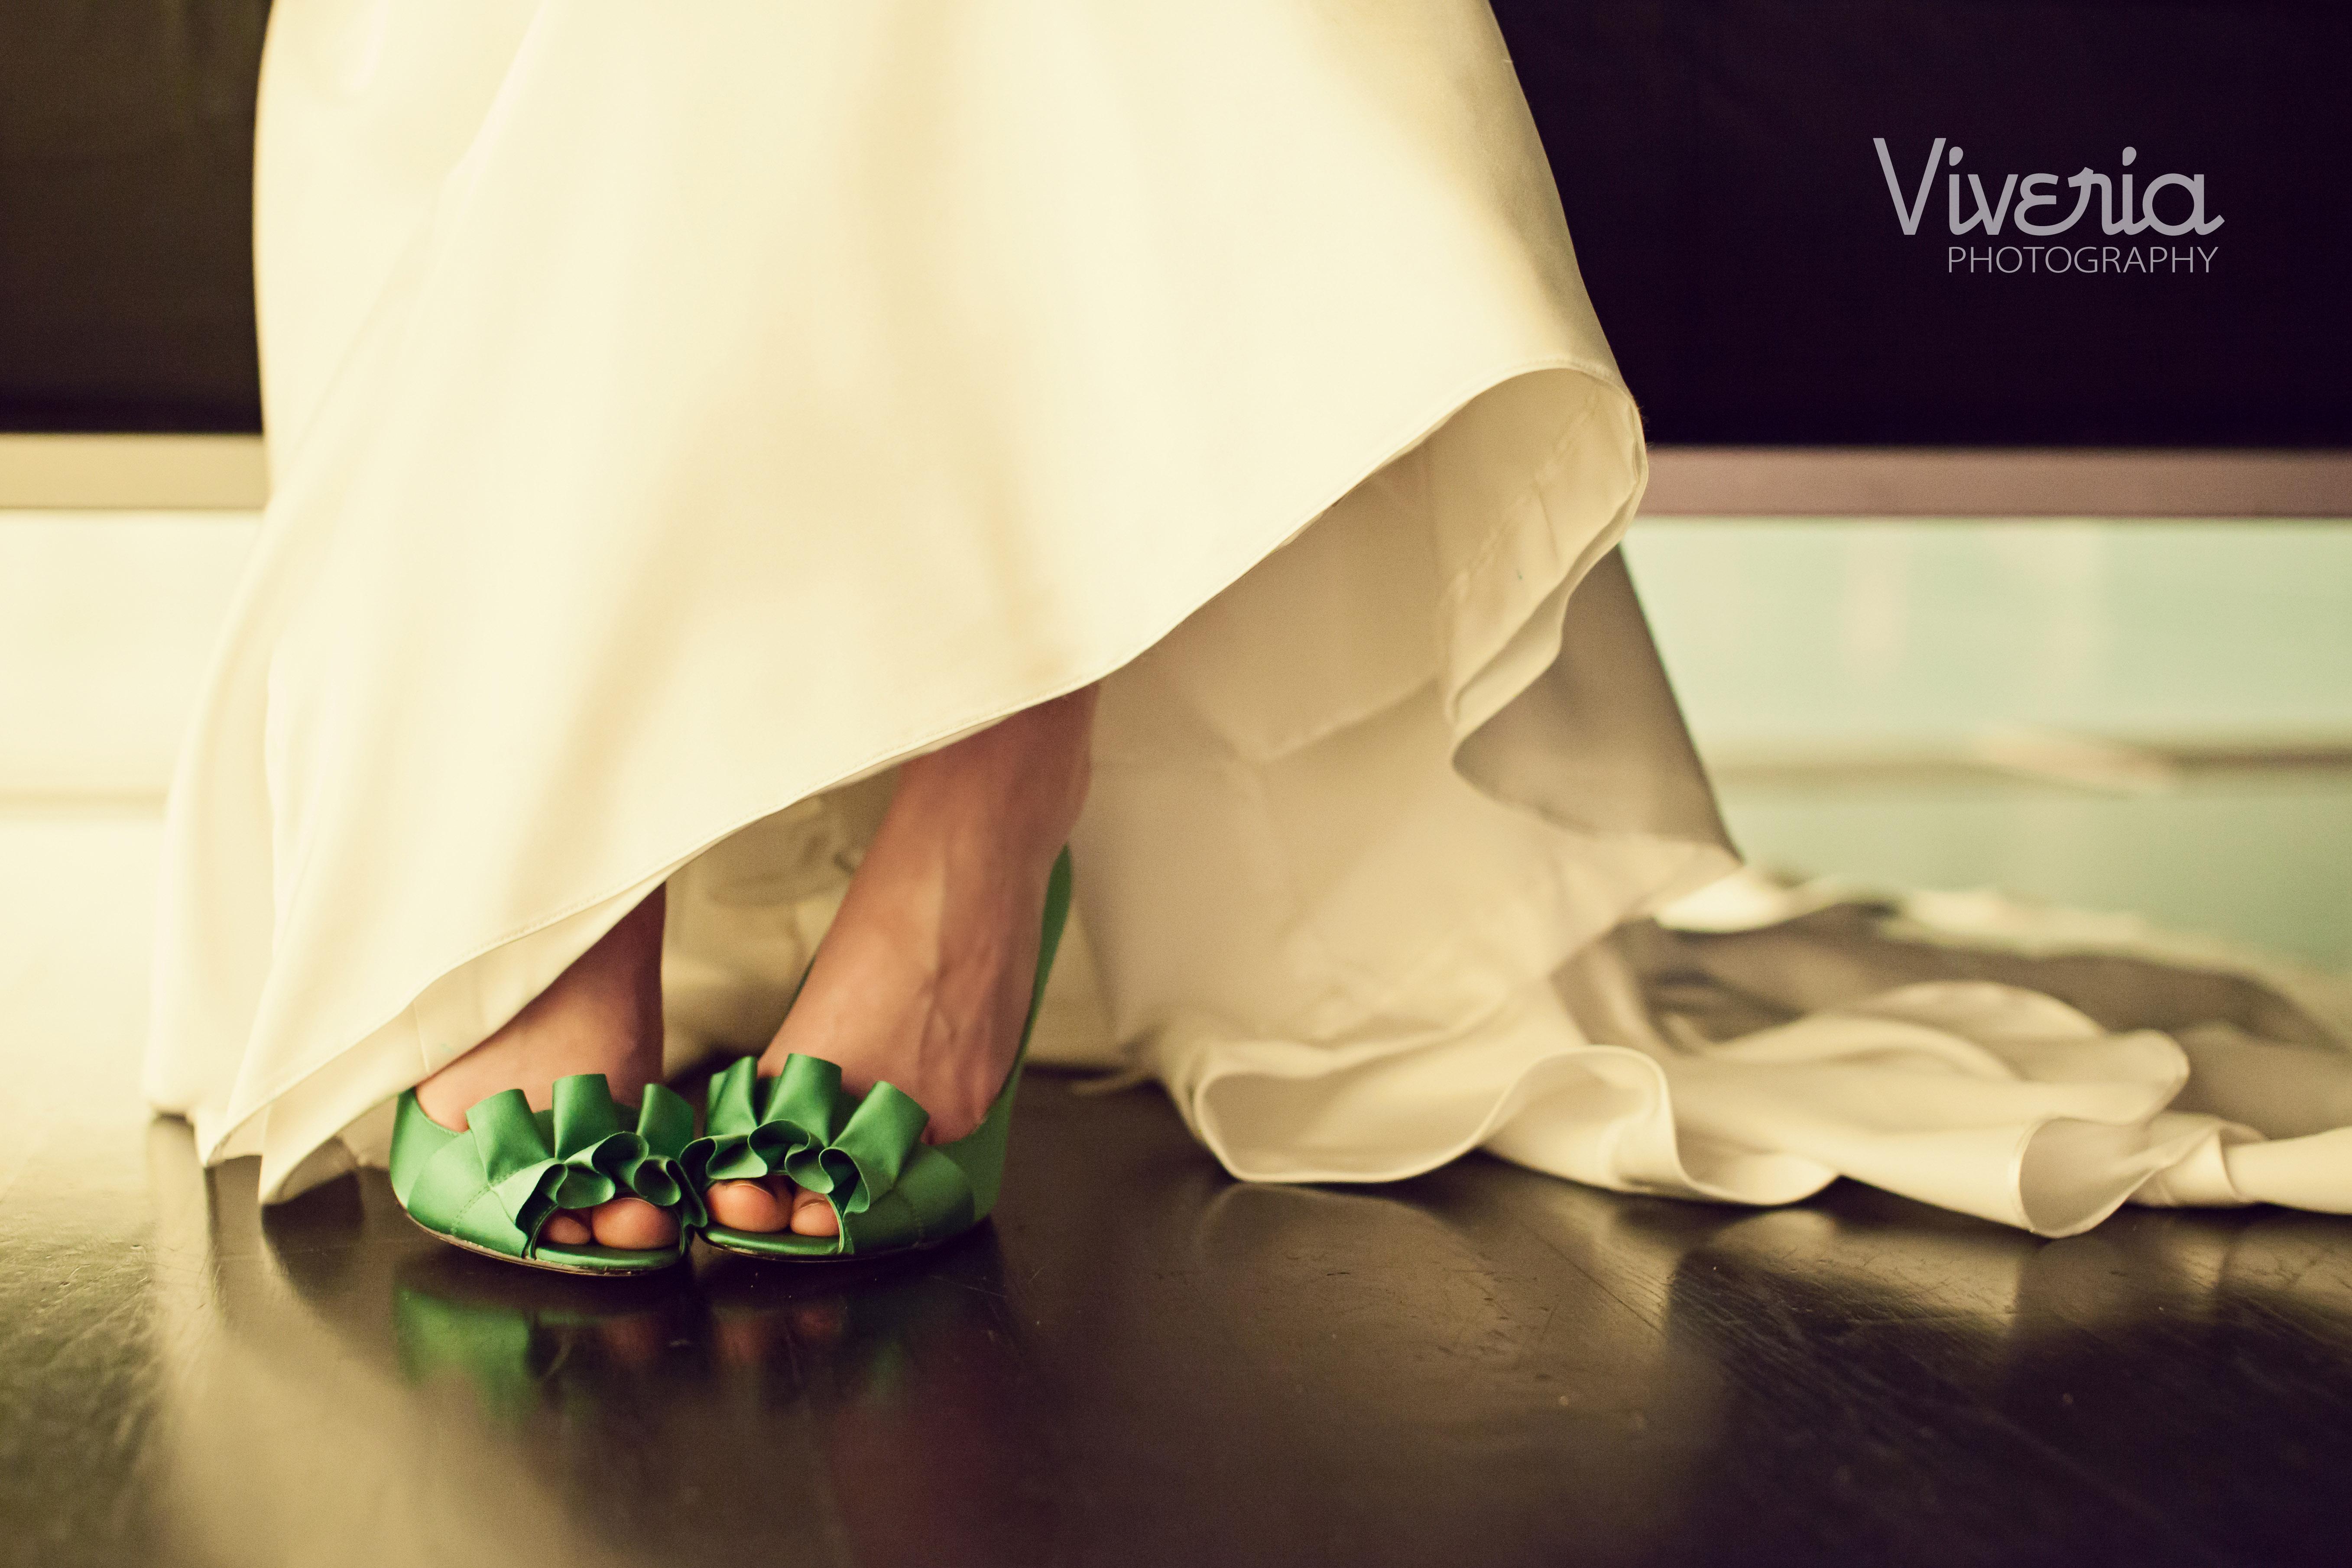 Viveria Photography